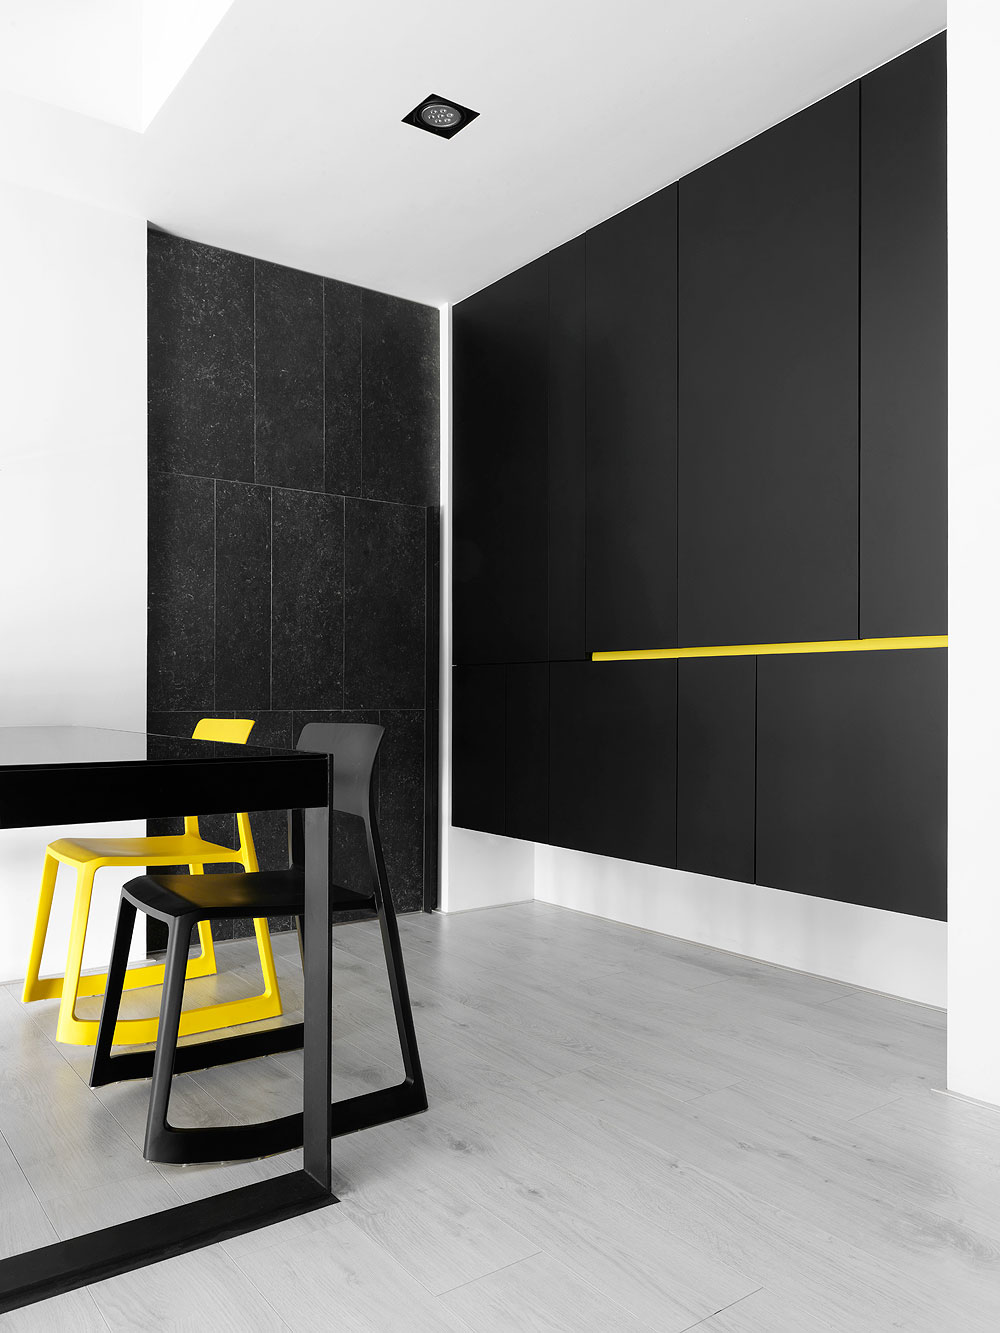 h-residence-z-axis-design (5)